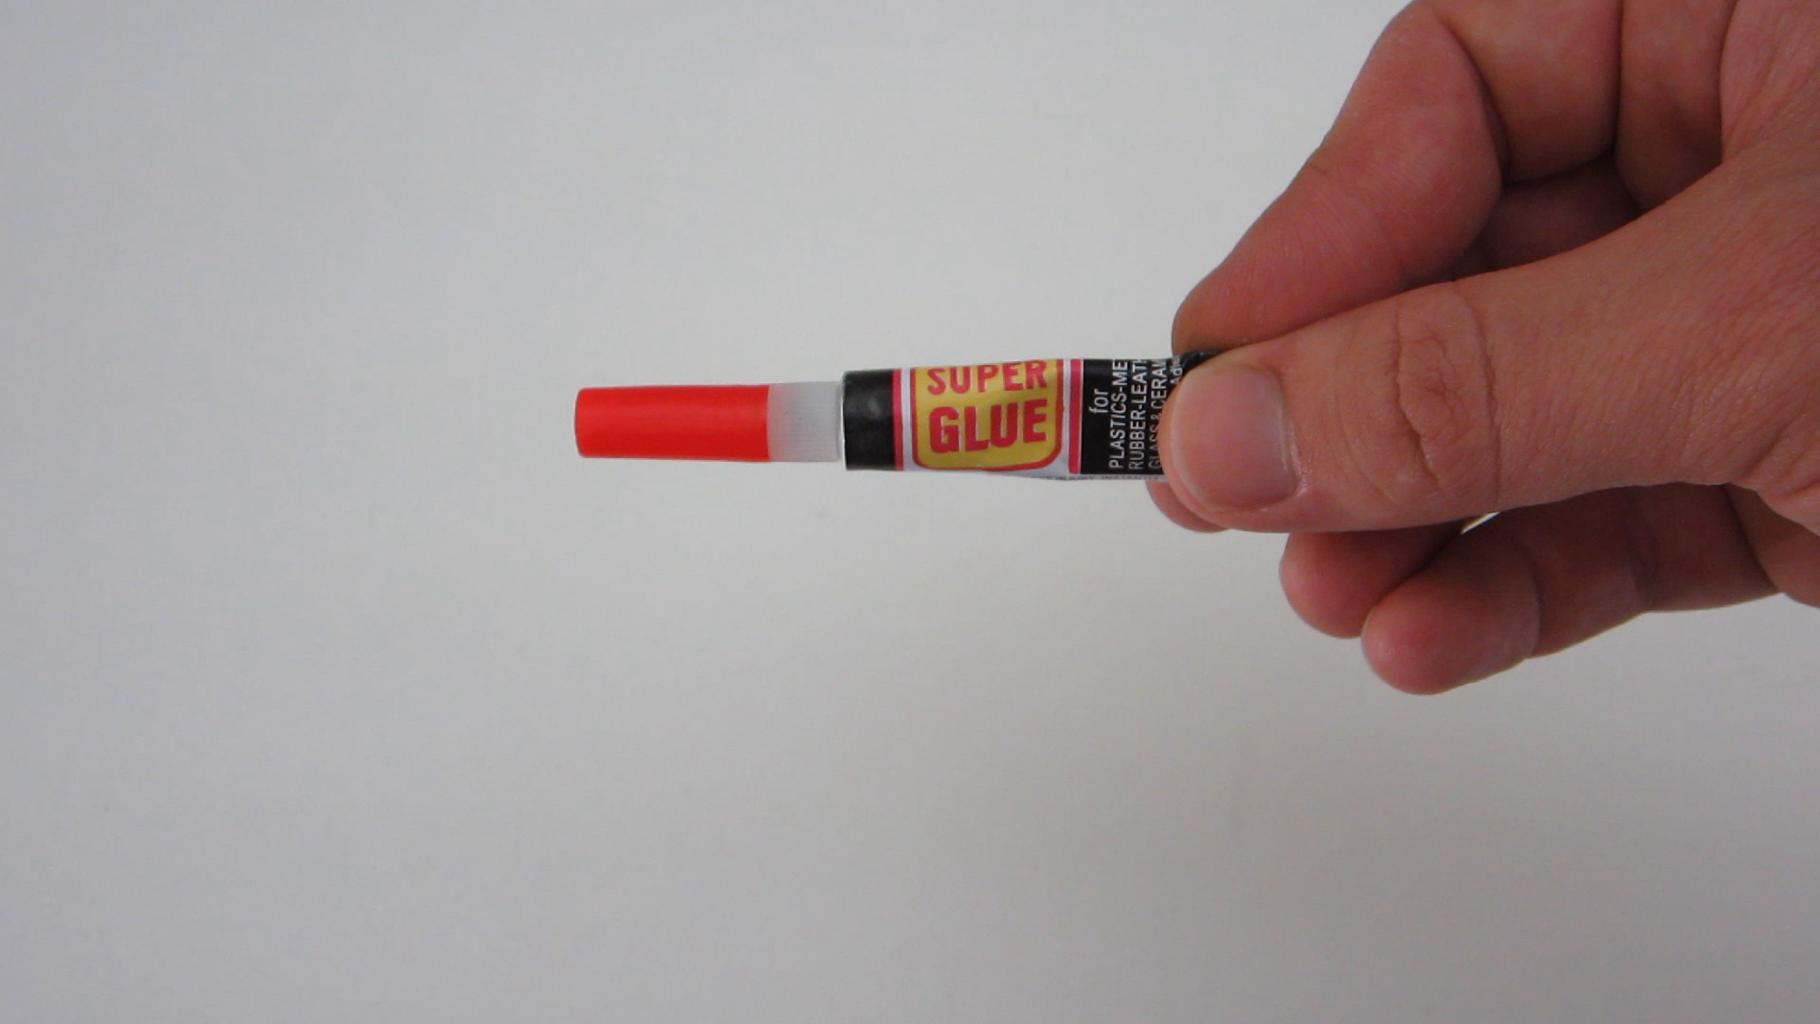 Background: Super Glue (cyanoacrylate)